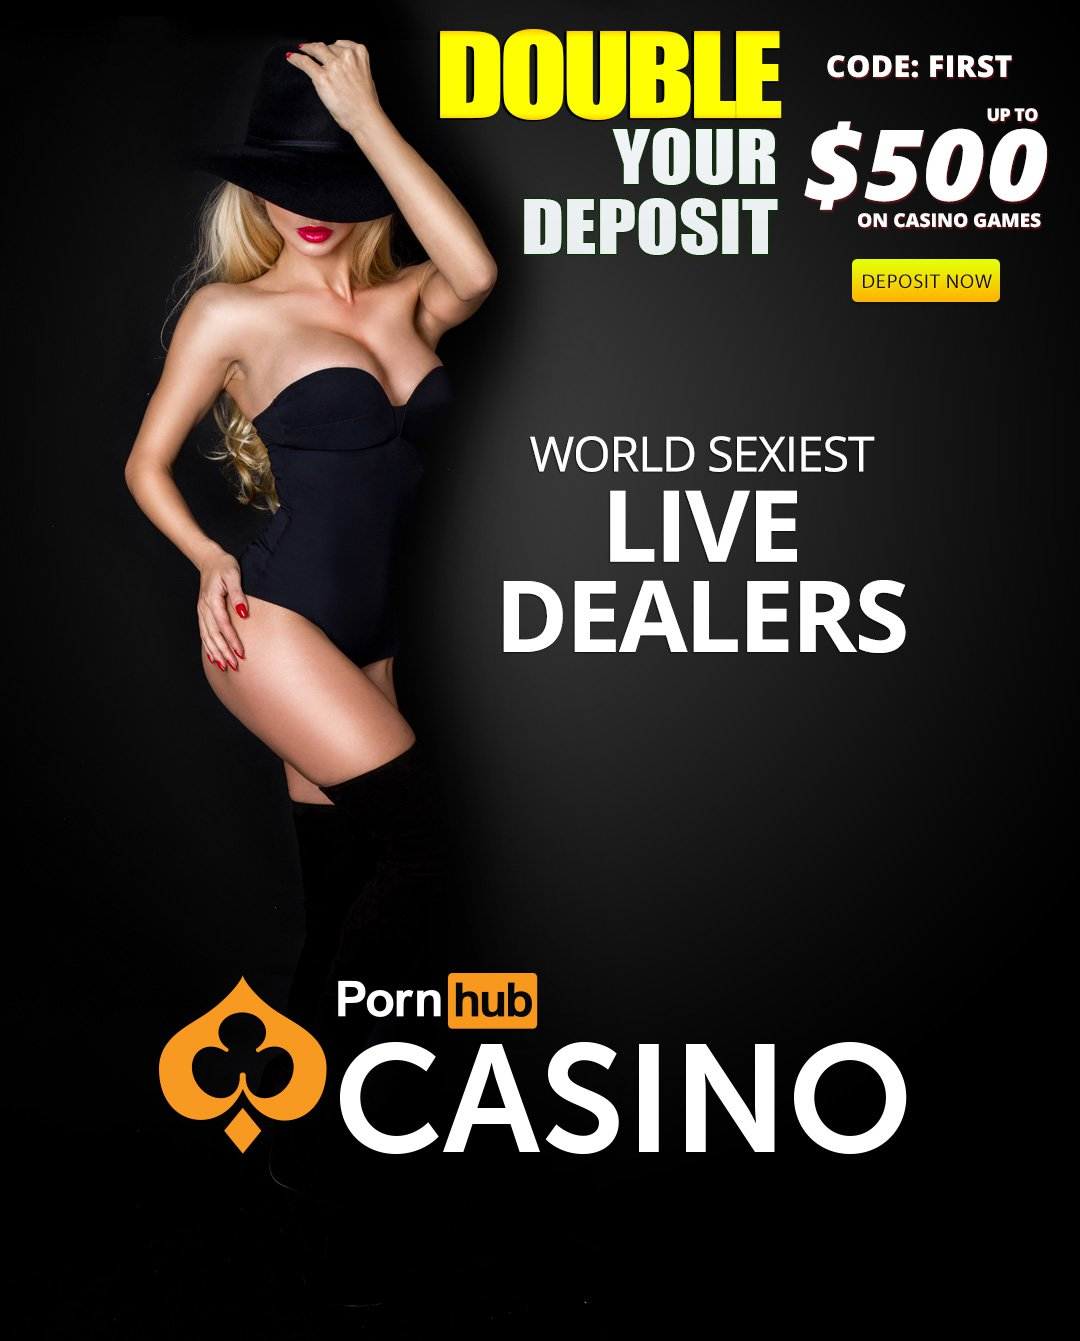 Promo Pornhub